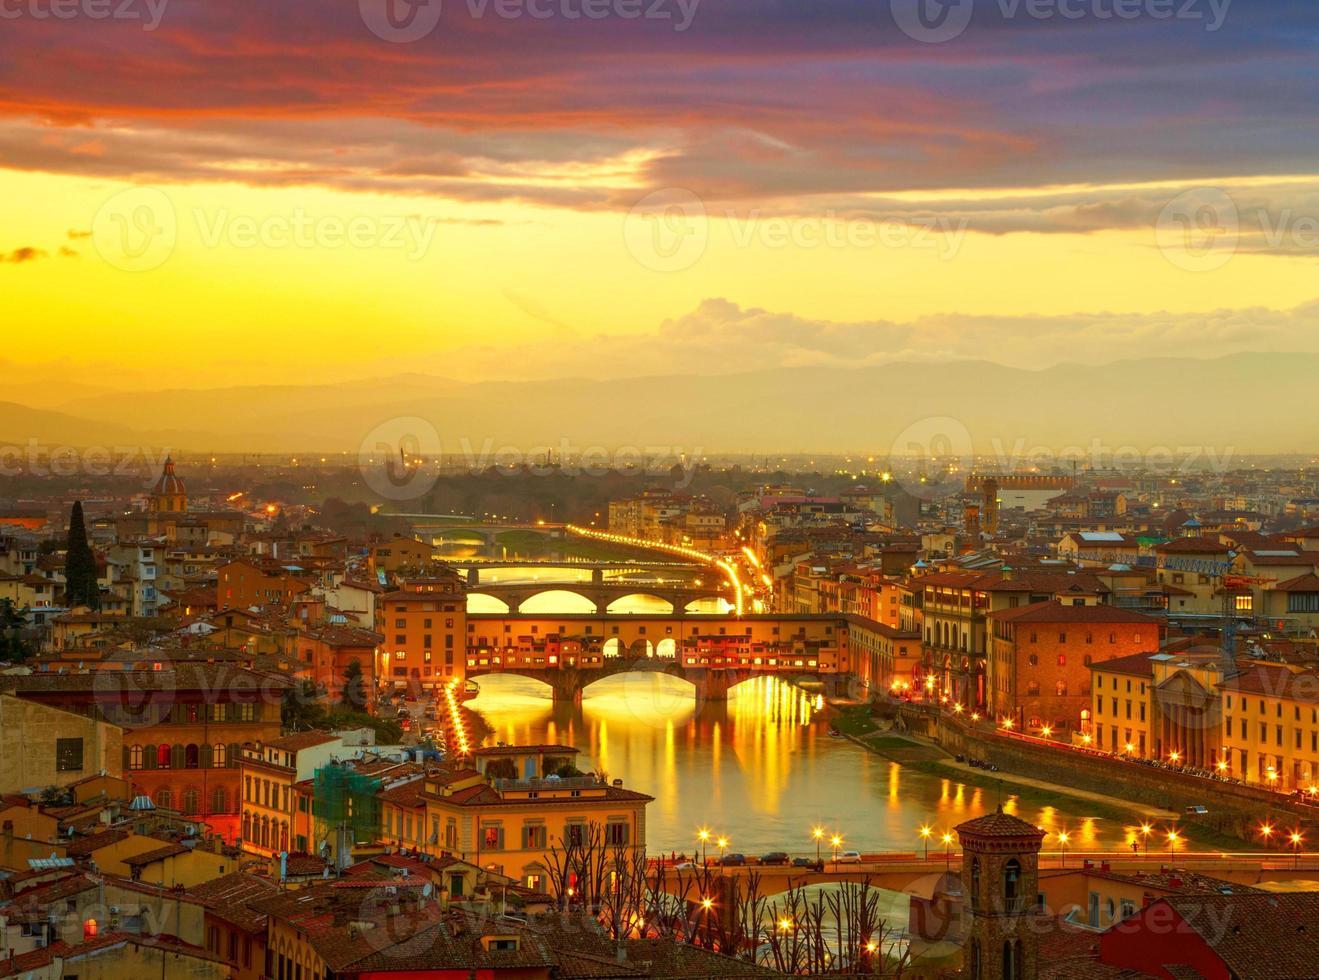 solnedgång utsikt över bron ponte vecchio. Florens, Italien foto